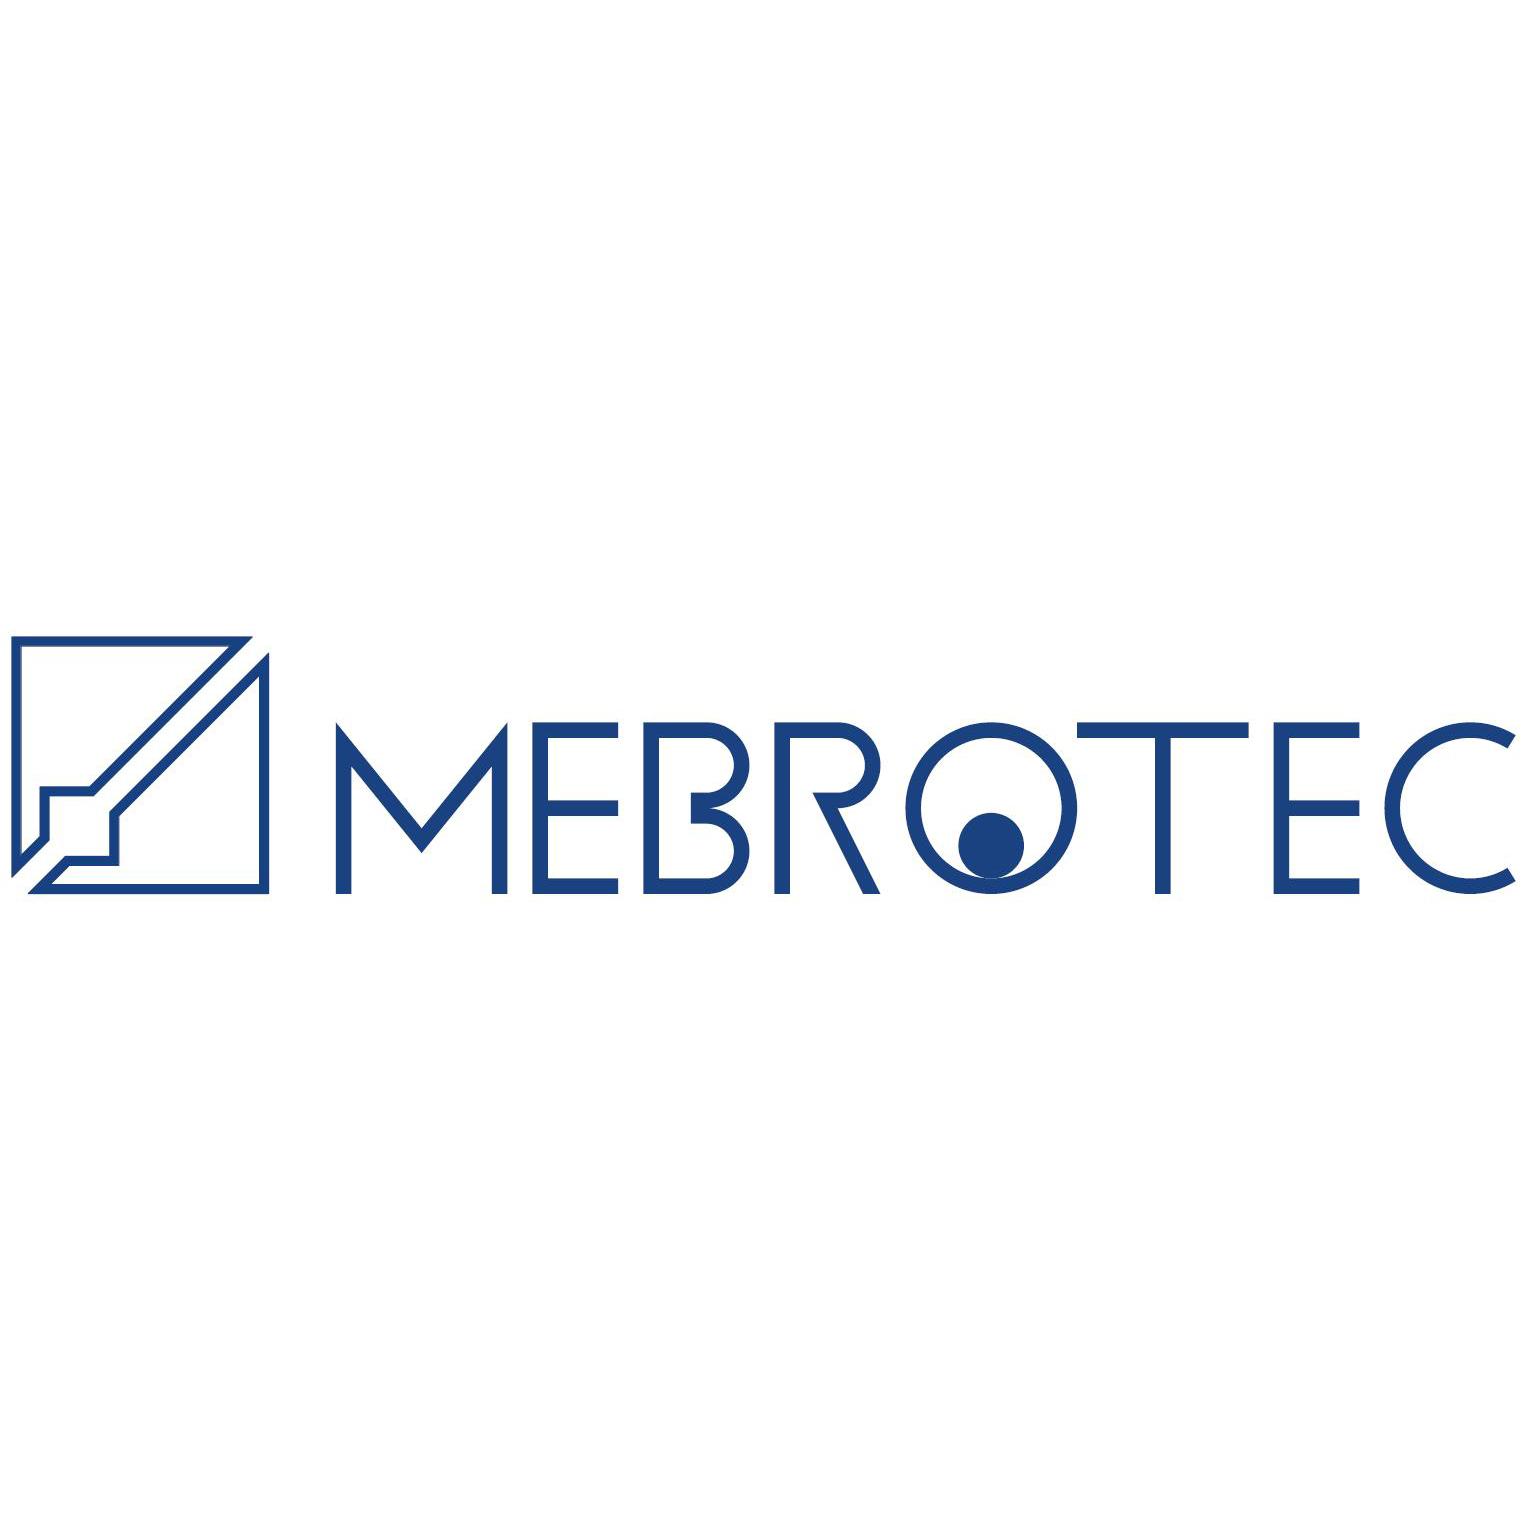 MeBro.Tec GmbH